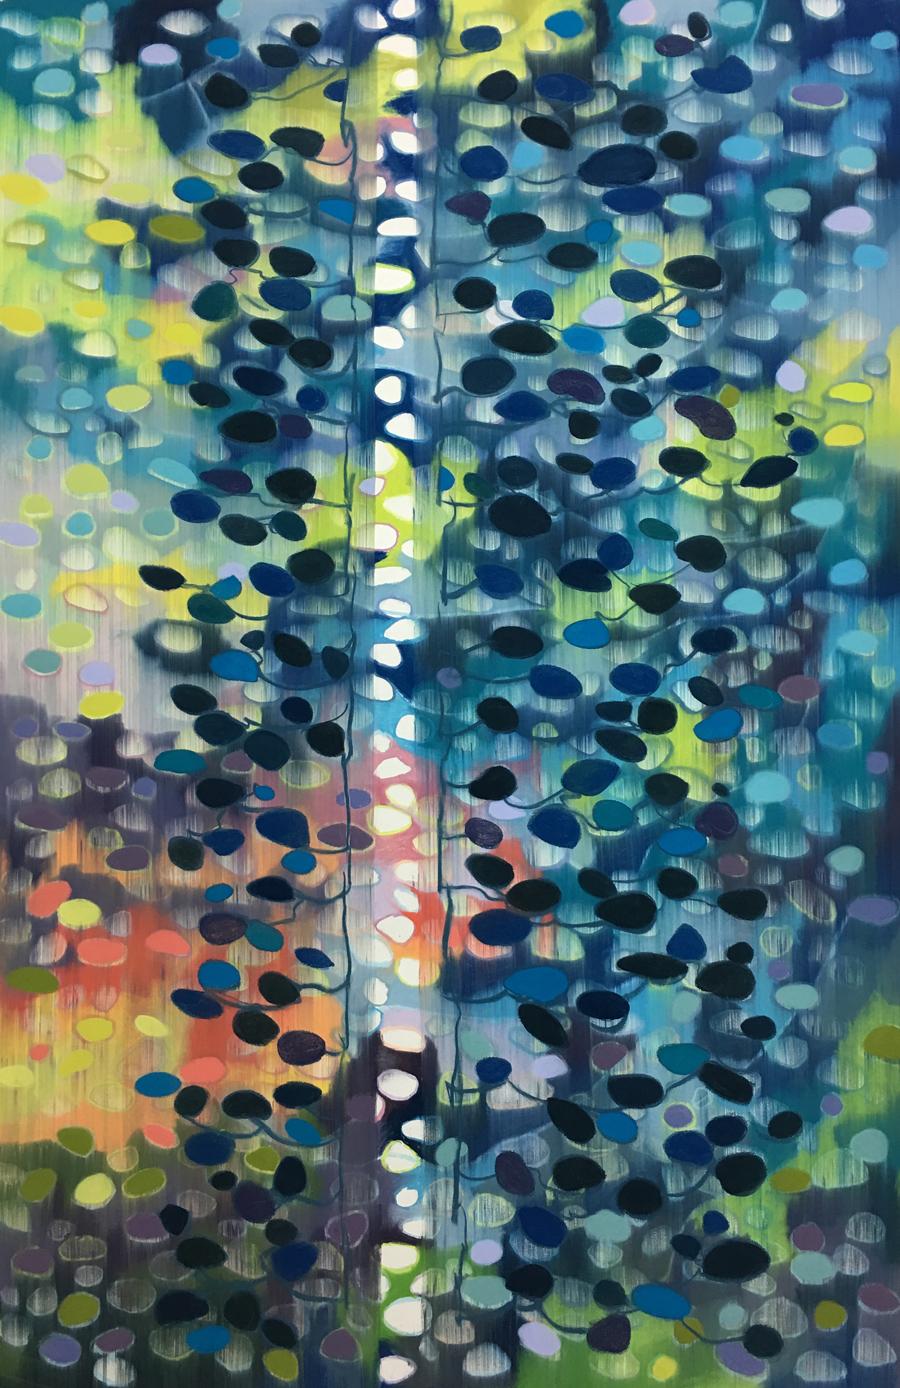 Silver Seam / Pastel on paper / 152cm x 102cm / 2018